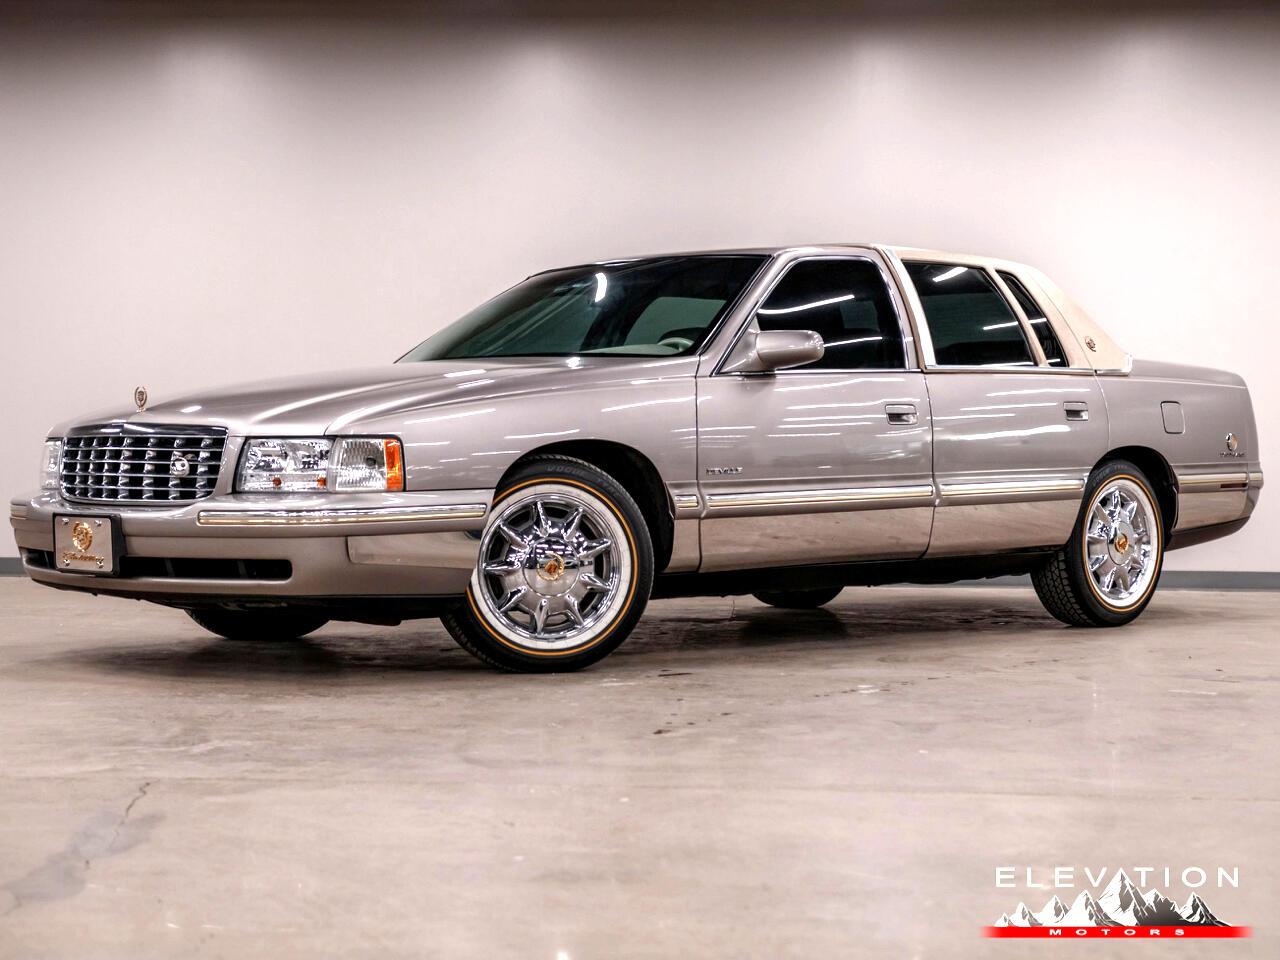 1998 Cadillac DeVille dElegance